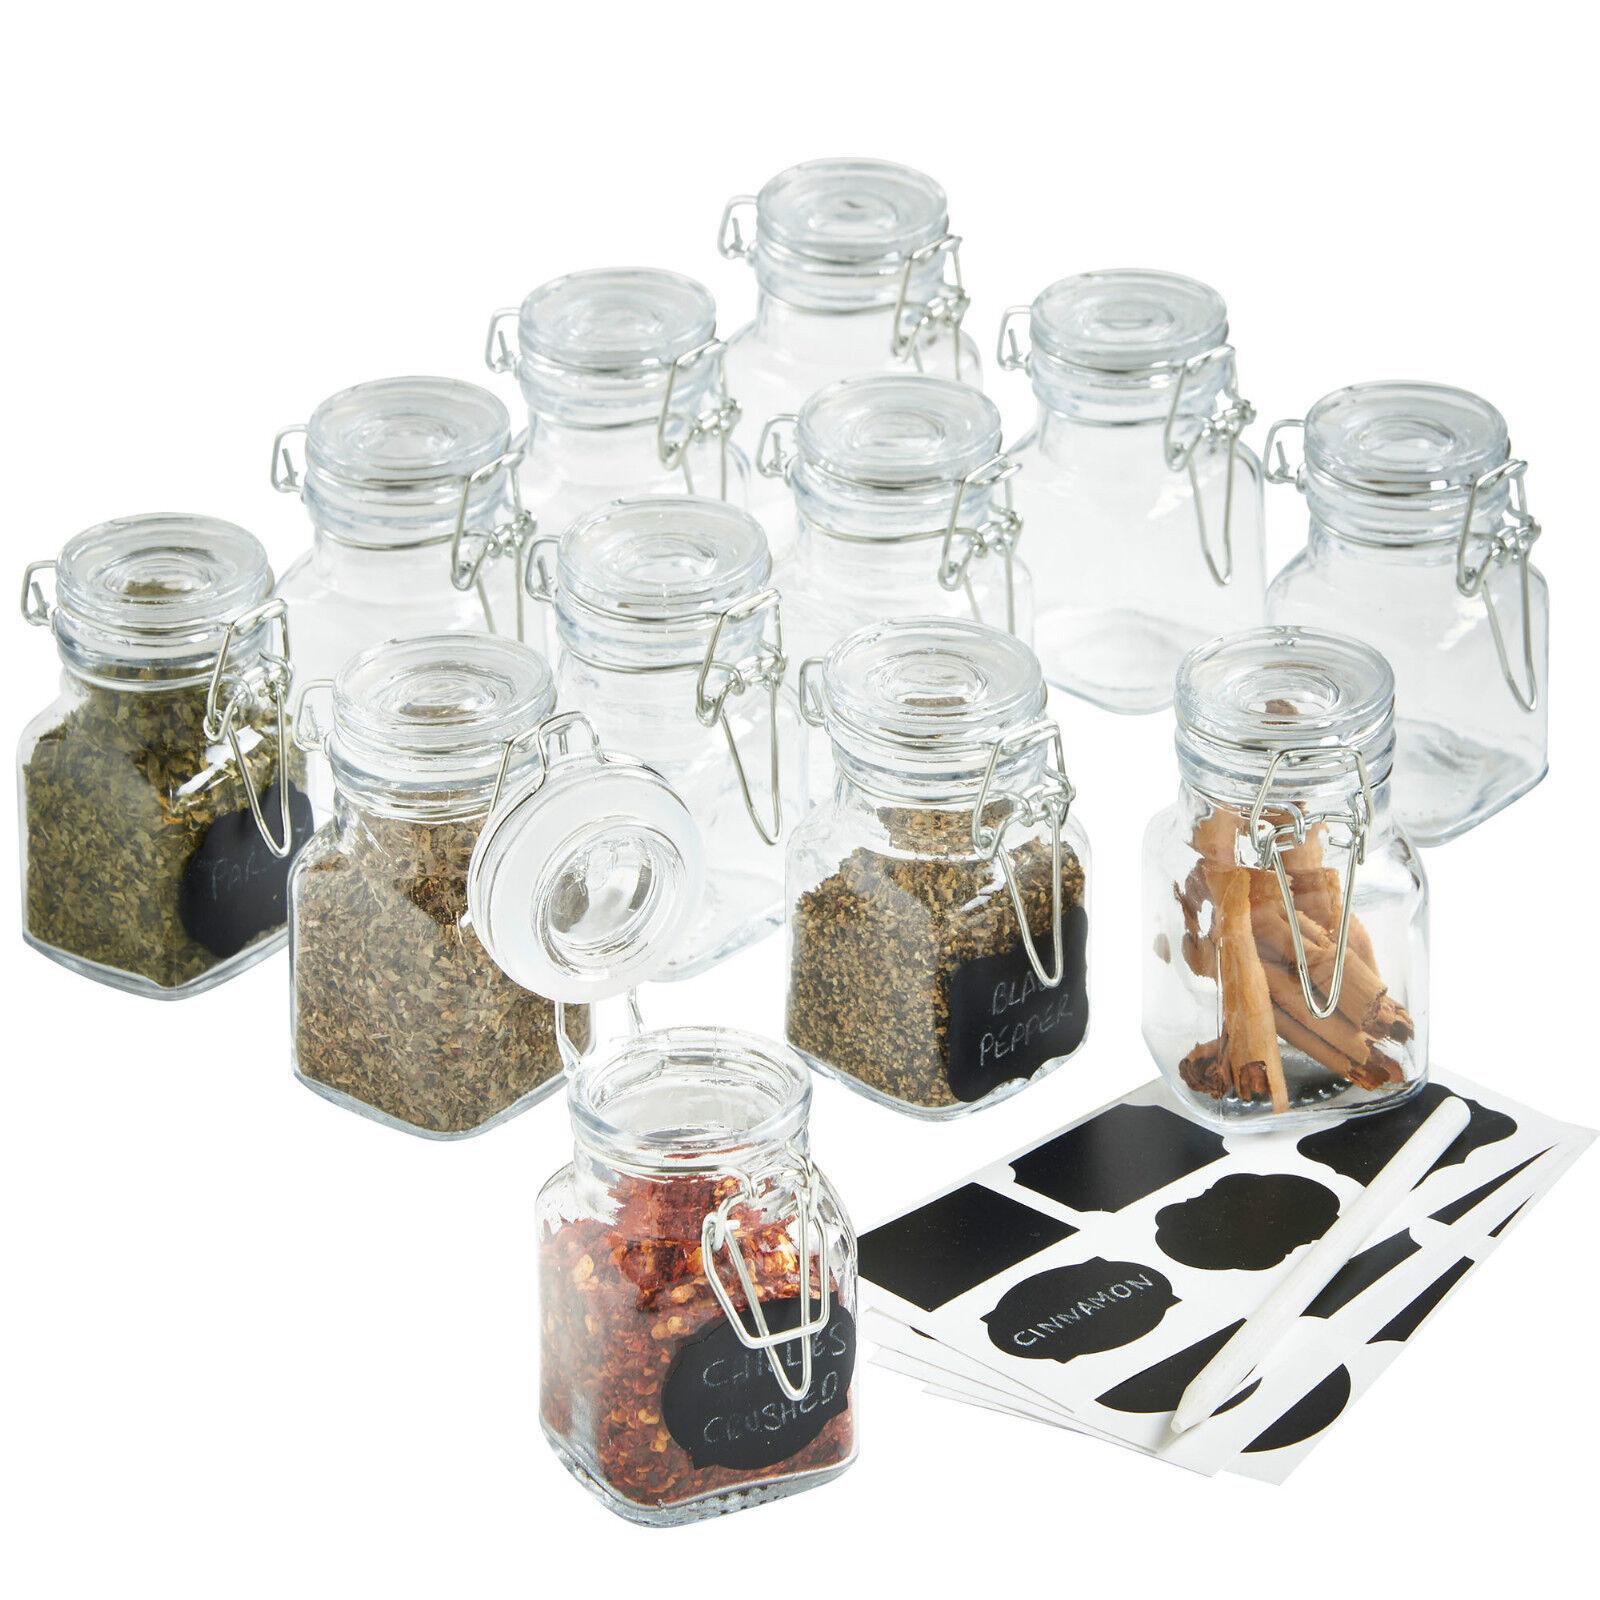 VonShef Glass Jars 12pc Mini Clip Top Airtight Seal Food Spice Storage  Preserve